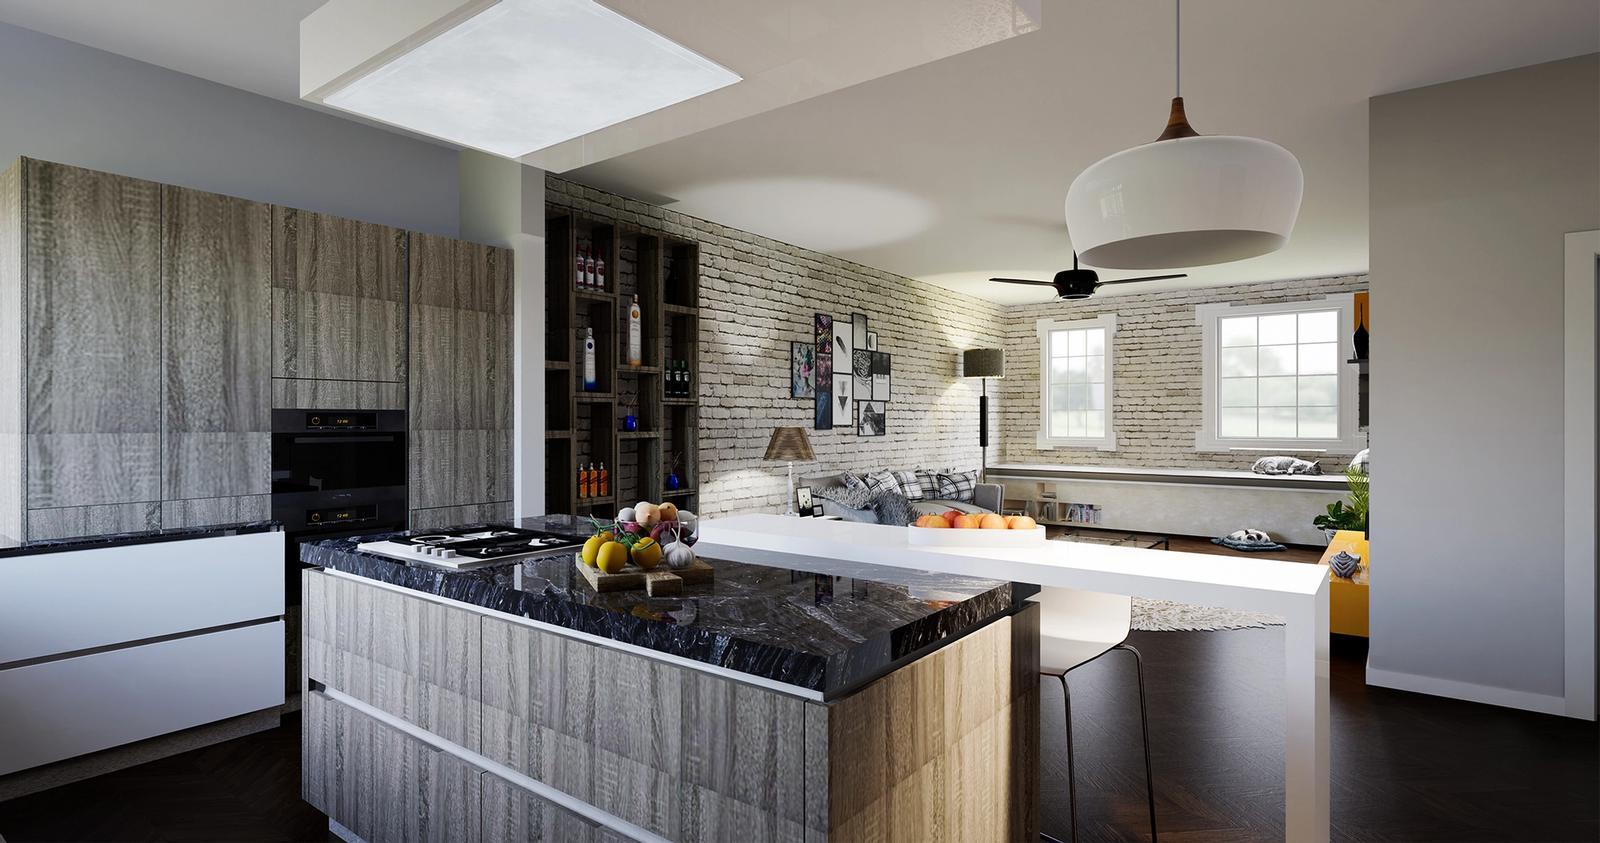 Kitchen Interior visualization ( SketchUp + D5 Render )